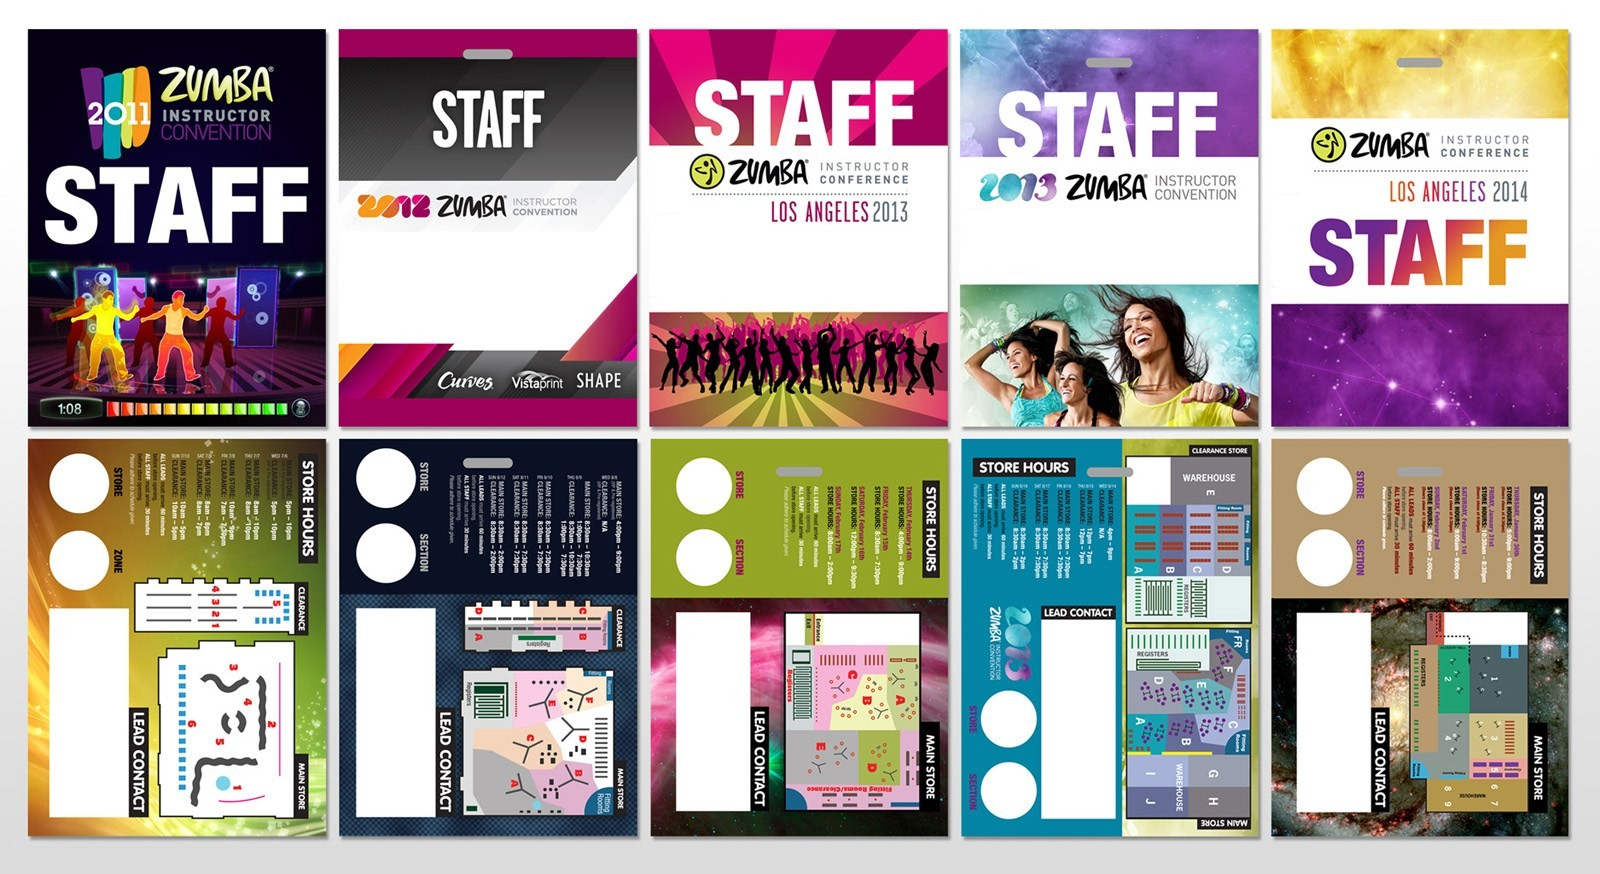 Staff badges